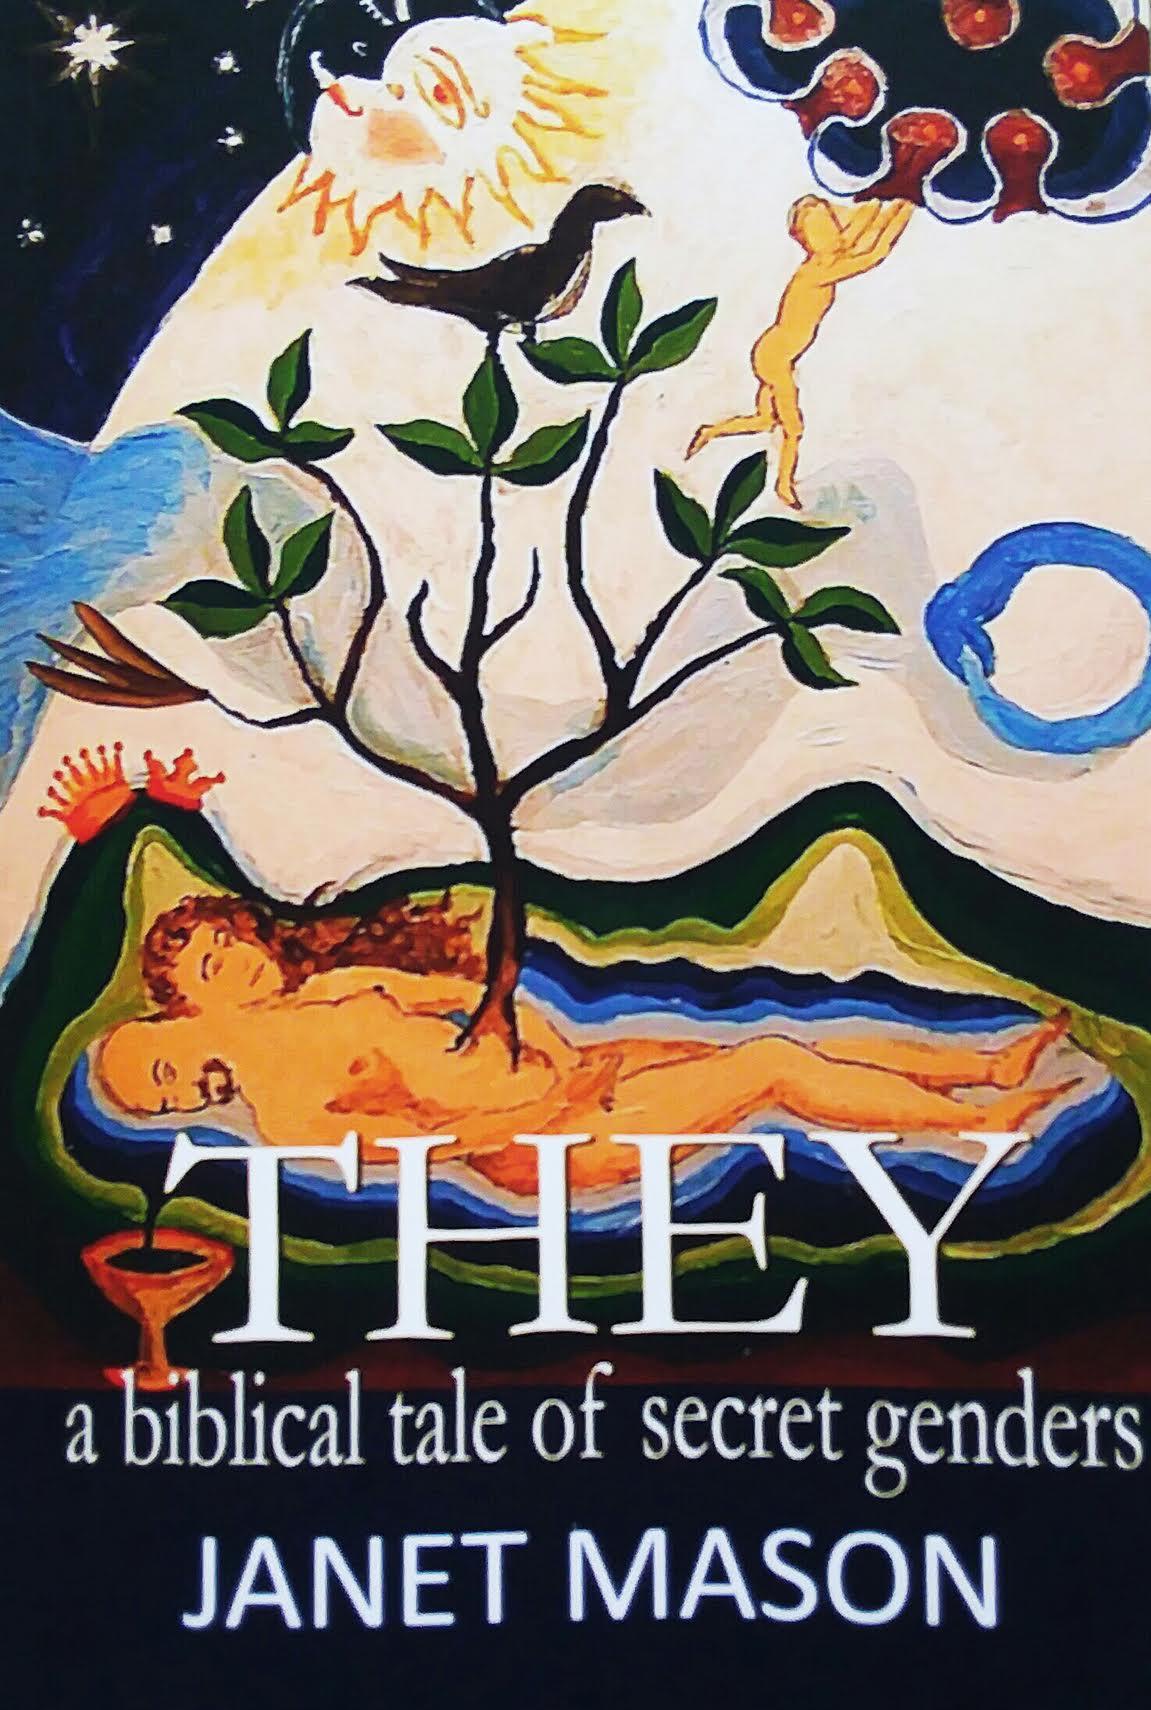 THEY, A Biblical Tale of Secret Genders by Janet Mason